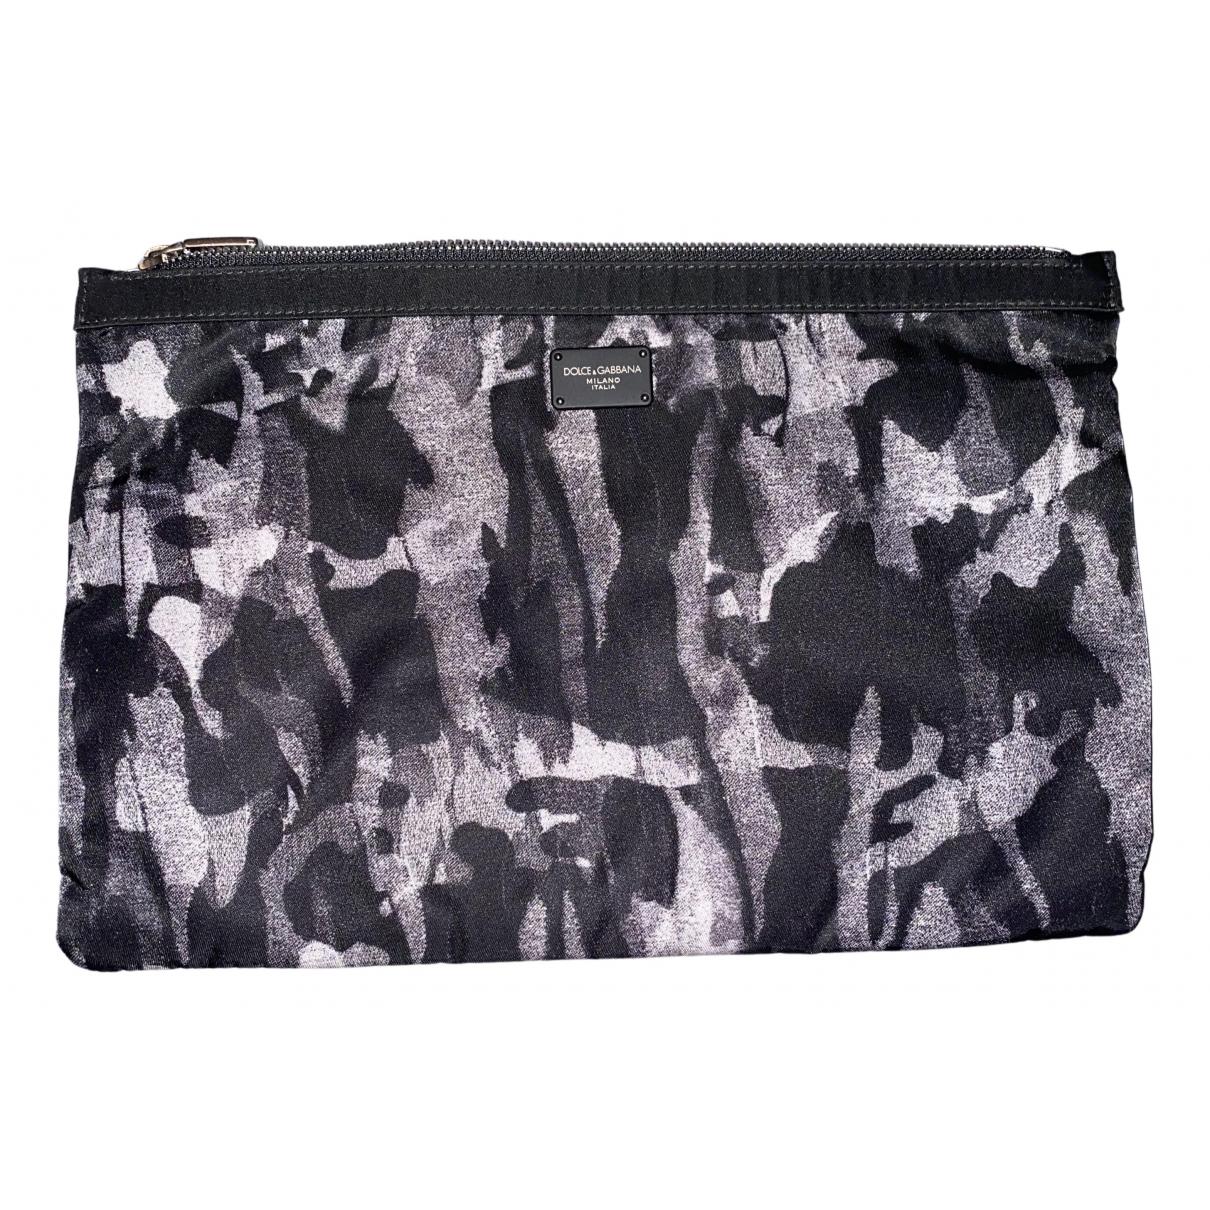 Dolce & Gabbana N Grey Cloth Small bag, wallet & cases for Men N